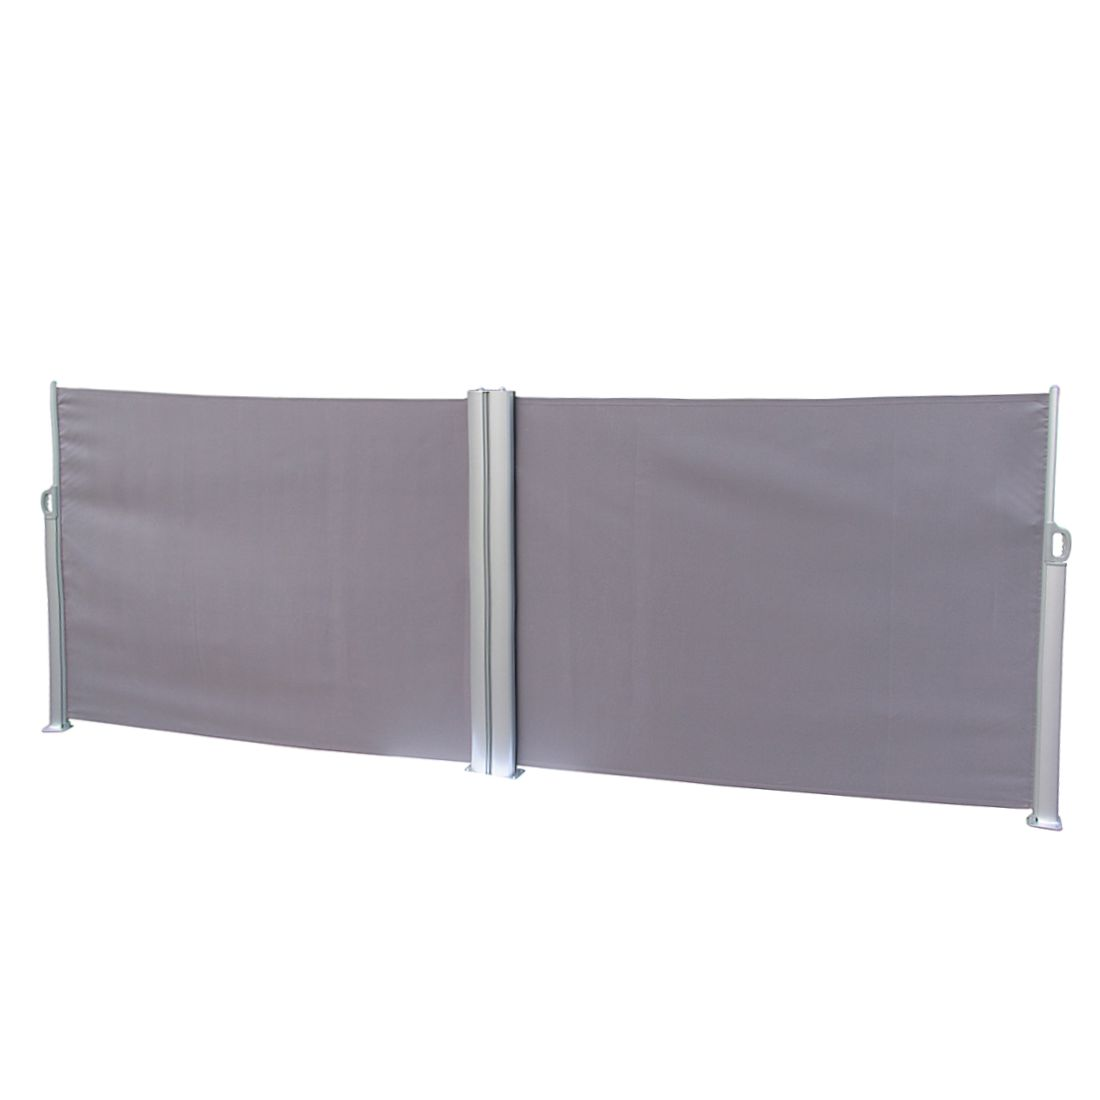 Doppel-Seitenmarkise Rush - Aluminium/Polyester - Anthrazit, Leco